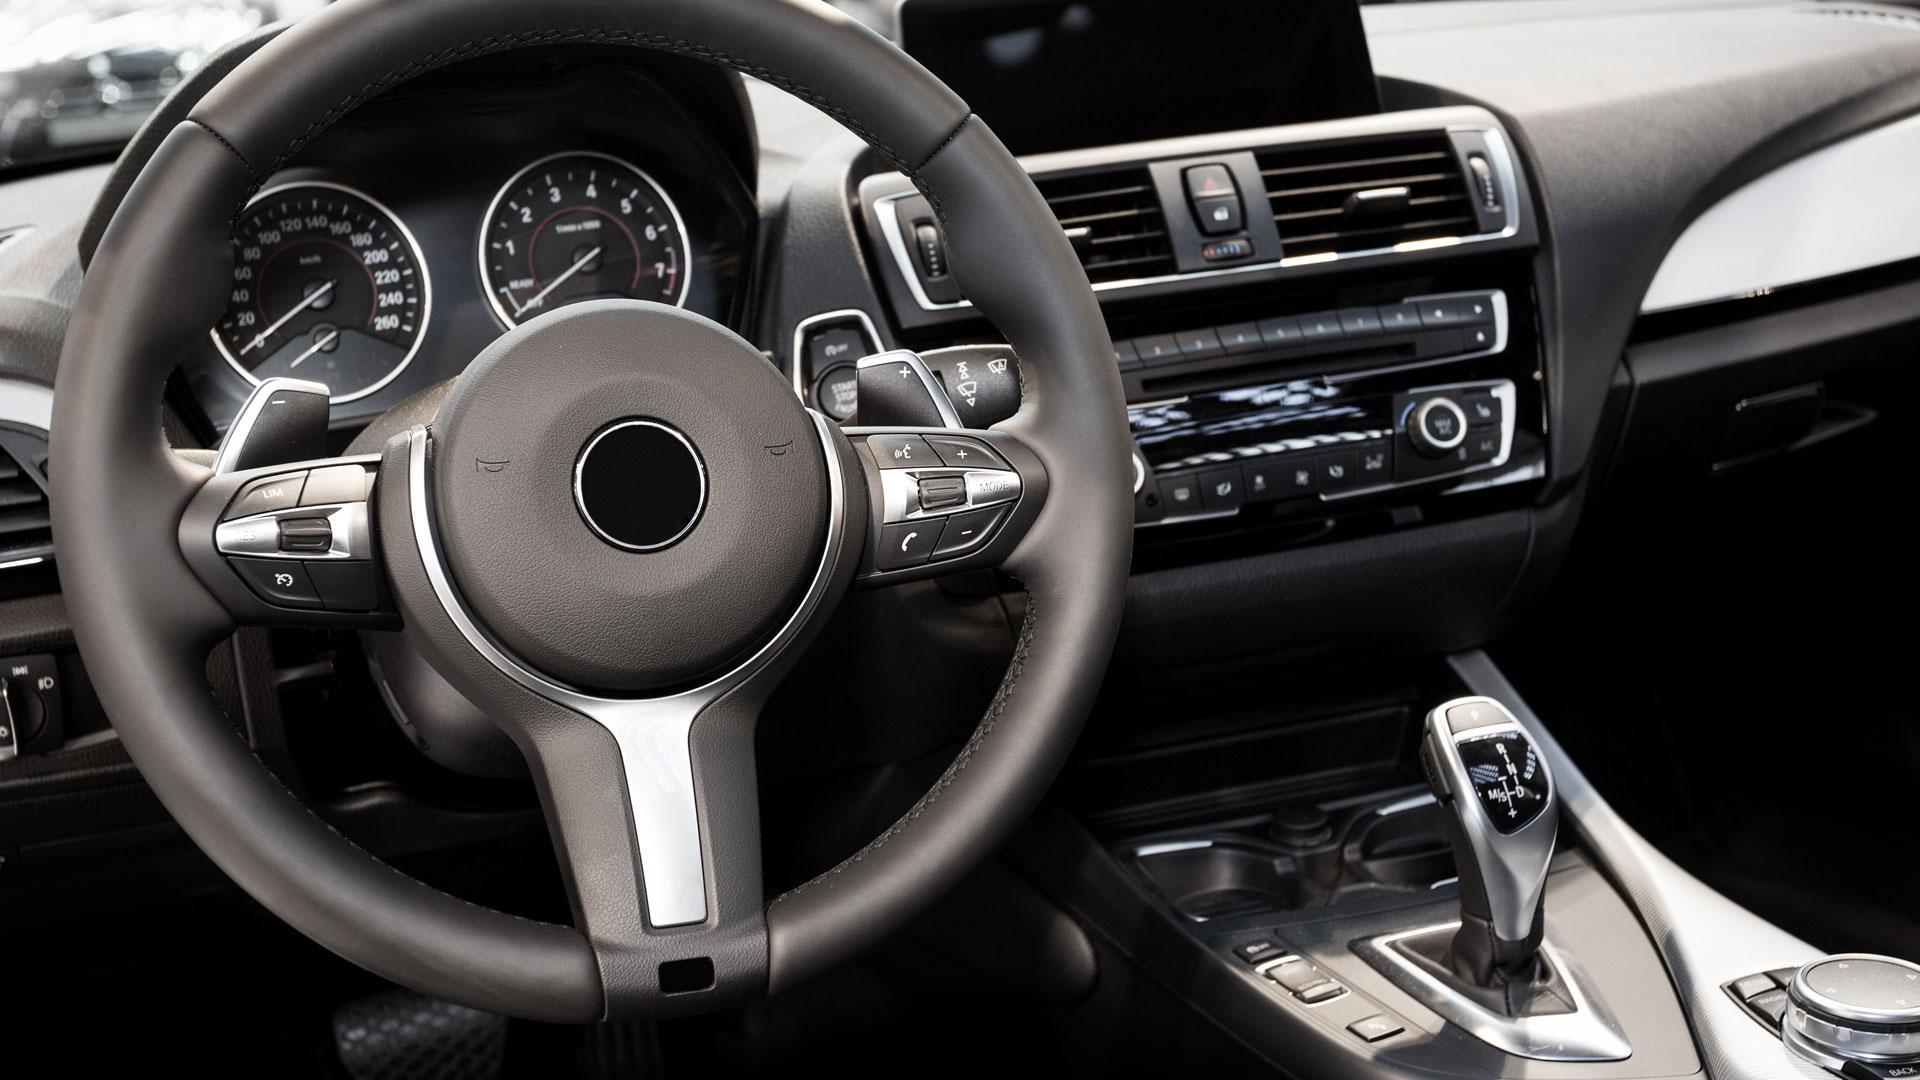 Interior of car cockpit